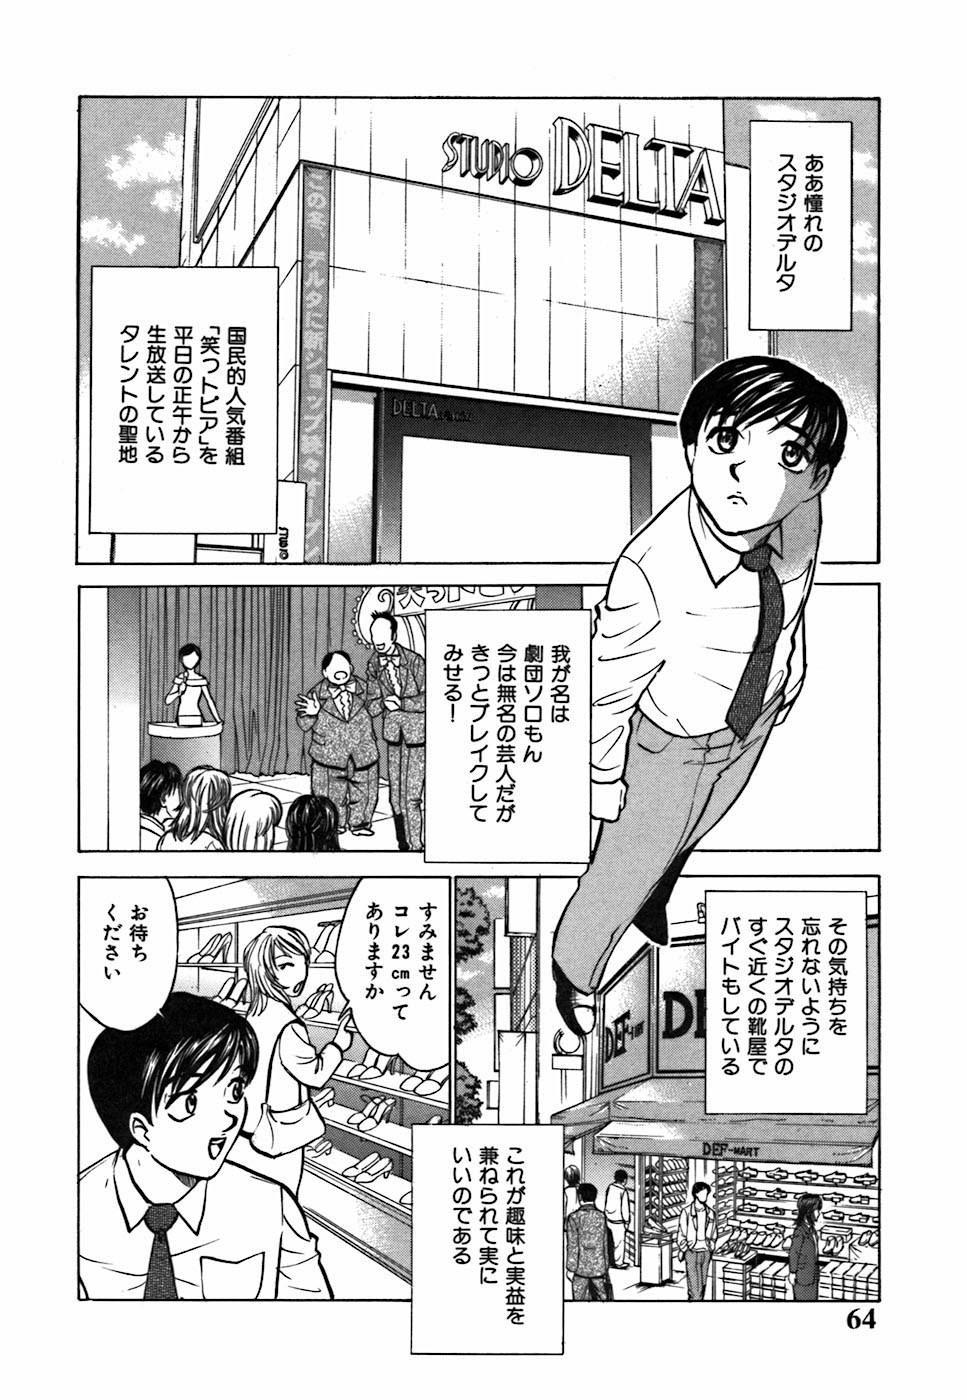 Kimi ga Nozomu Katachi | Appearance for which you hope 63